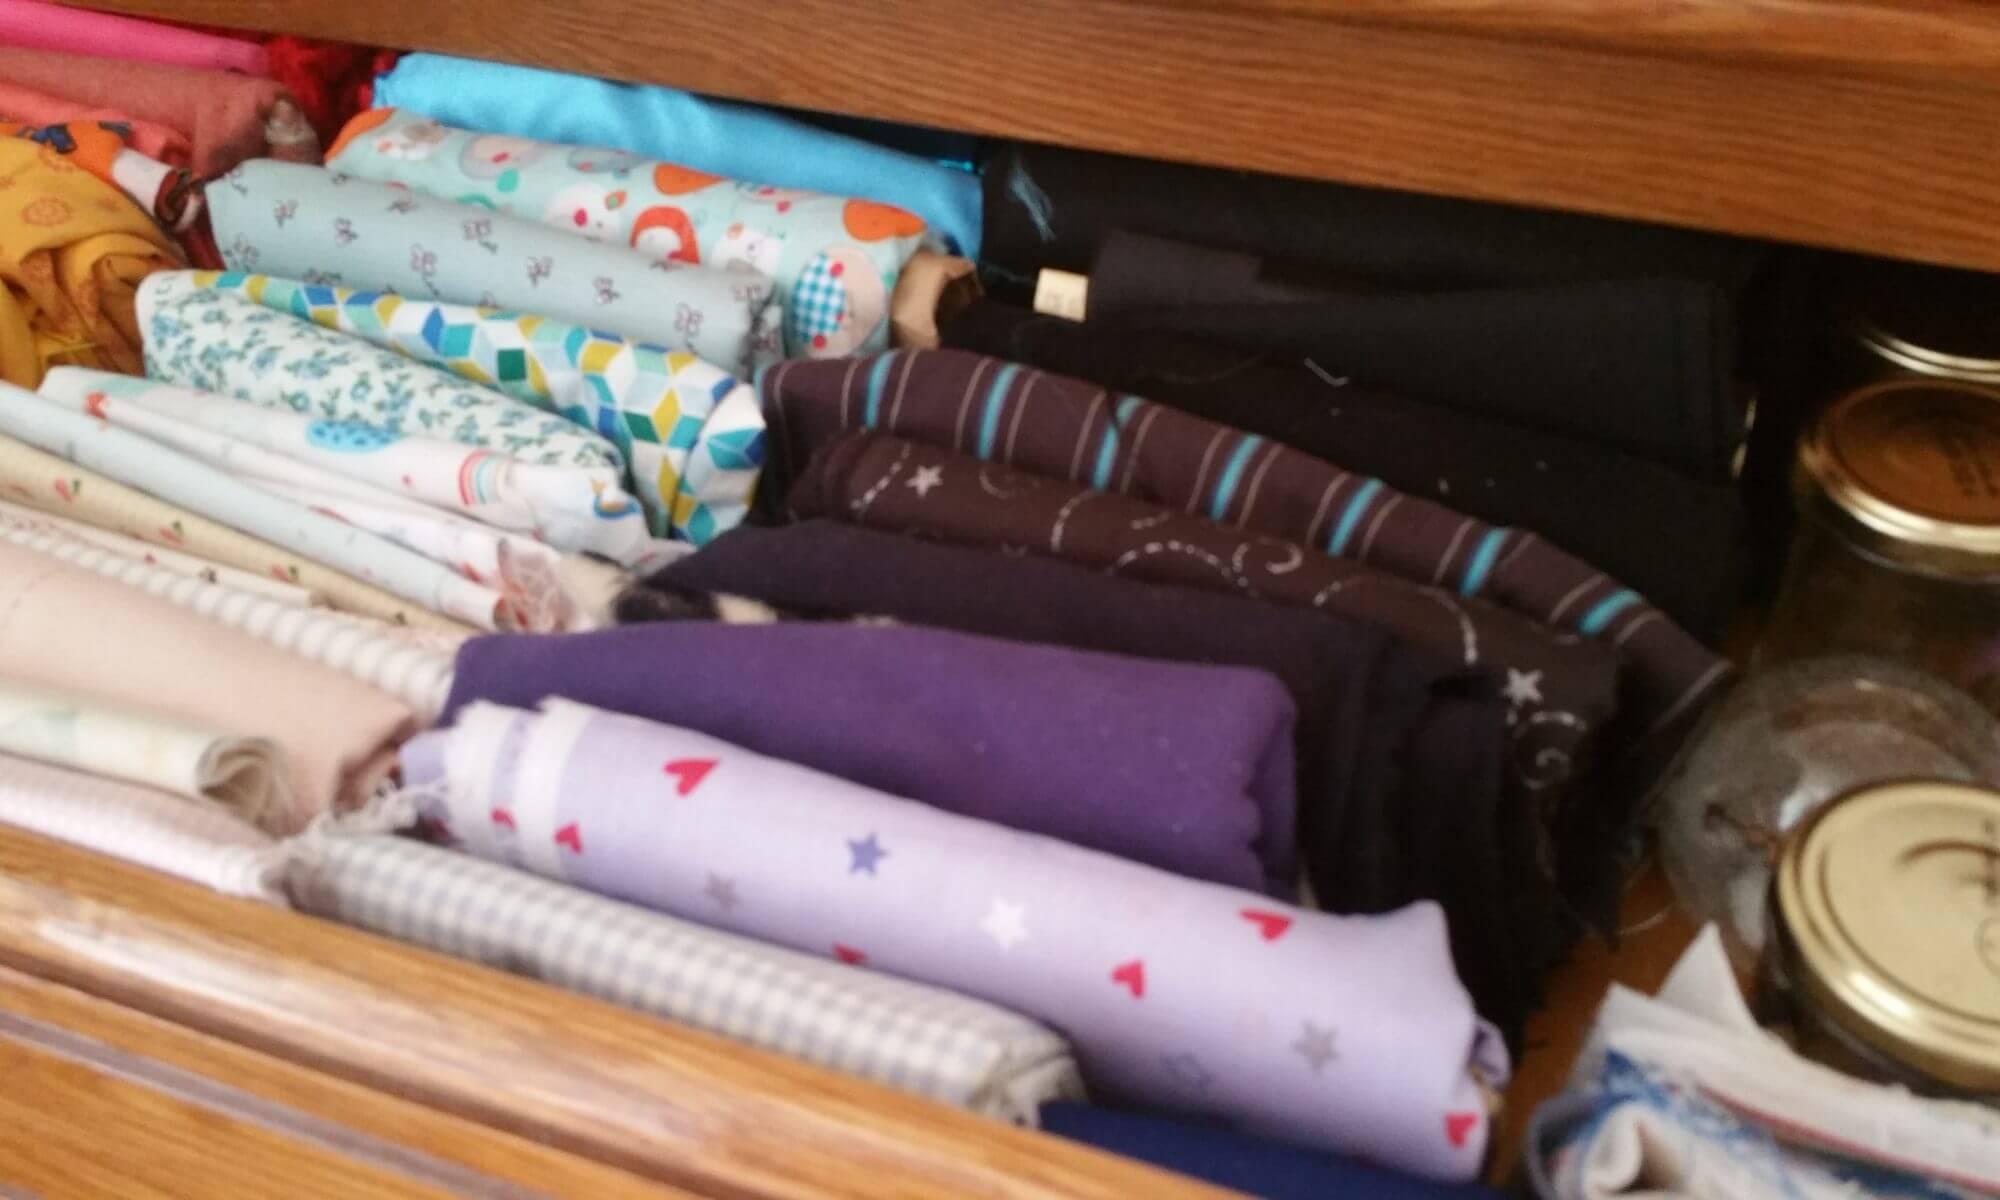 organisation couture rangement coupons en tissu